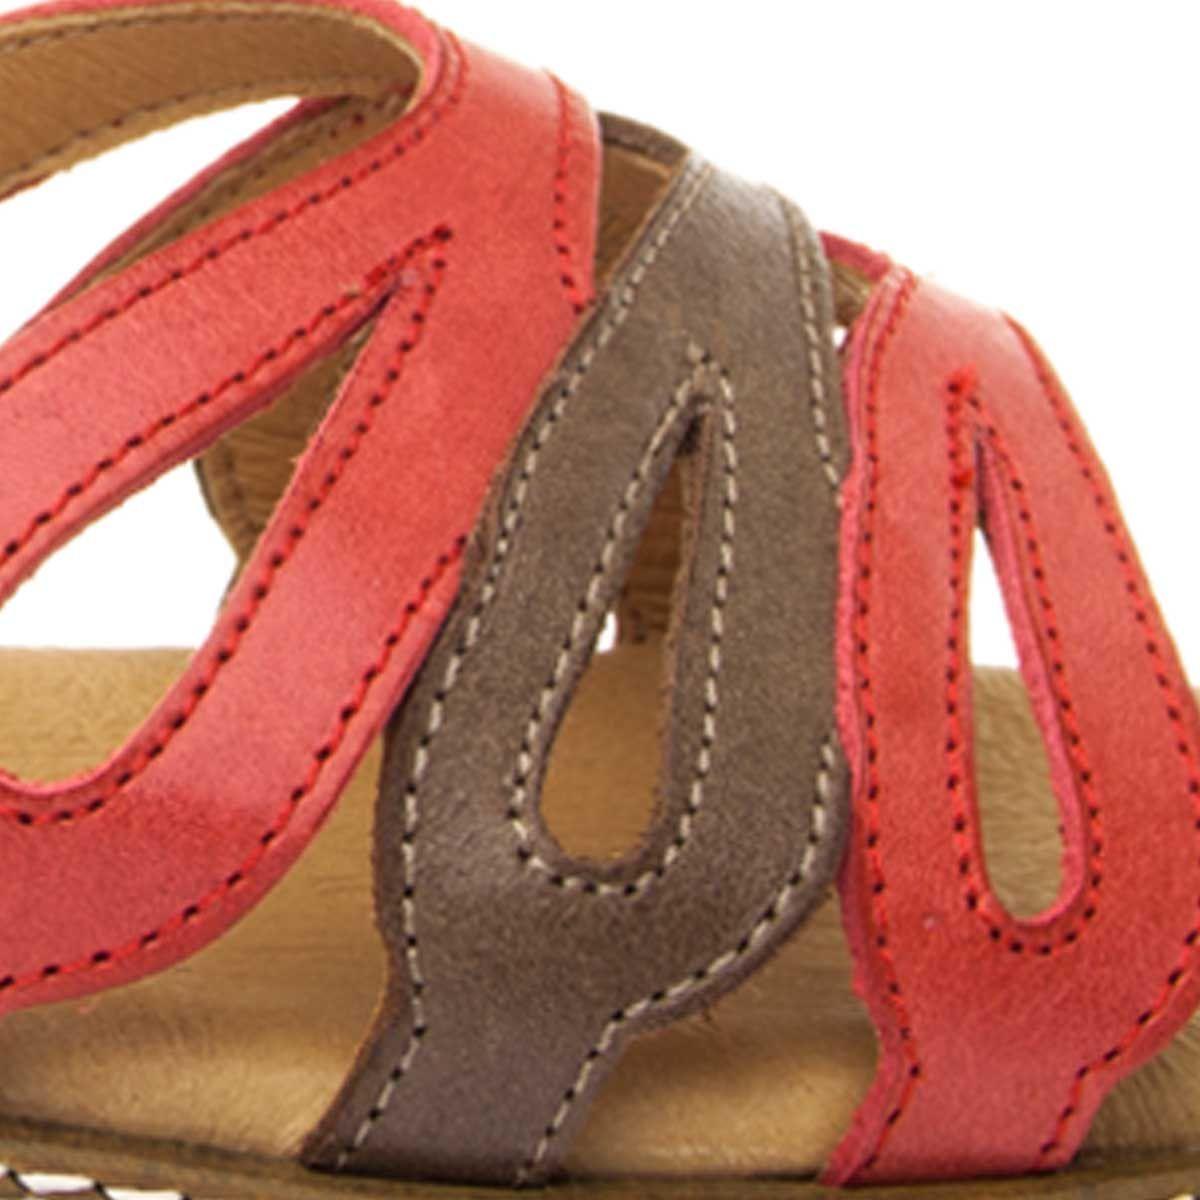 Purapiel Flat Wedge Sandal in Red